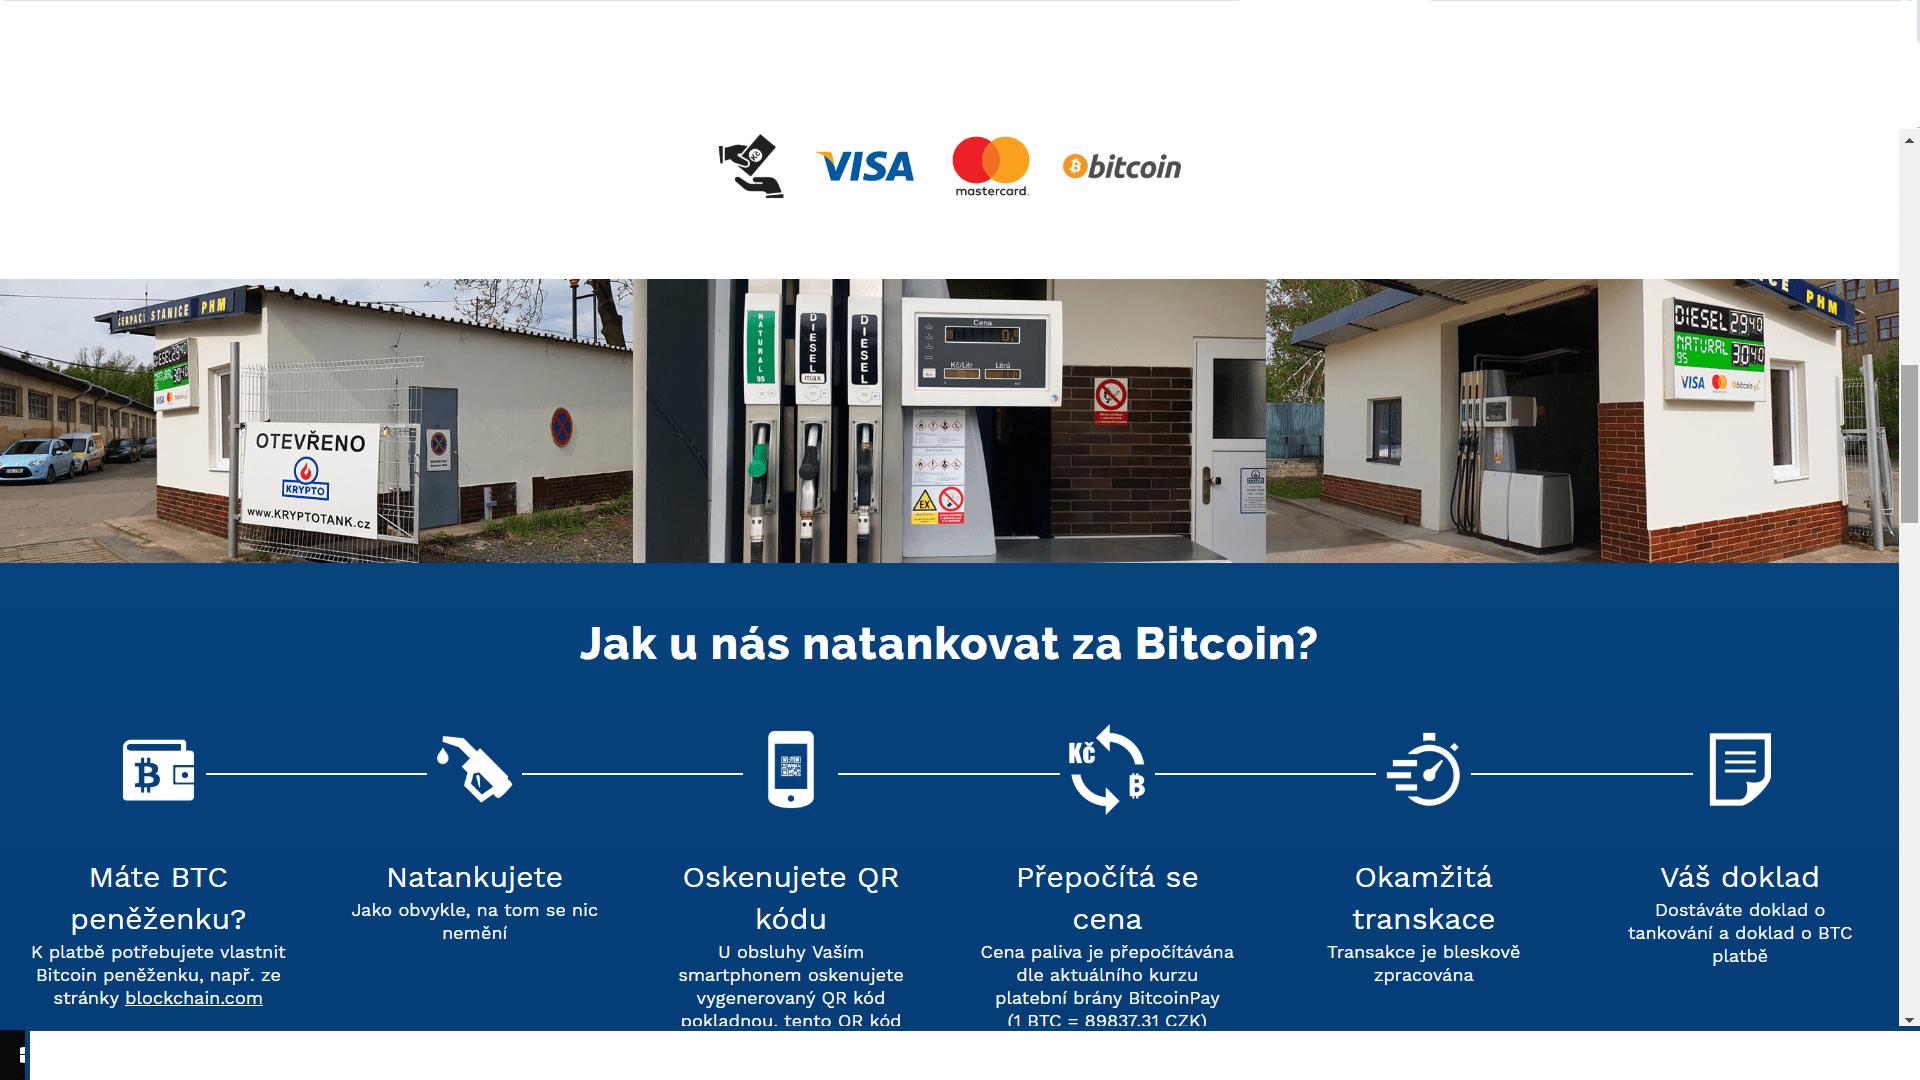 cerpaci stanice krypto platba bitcoinem